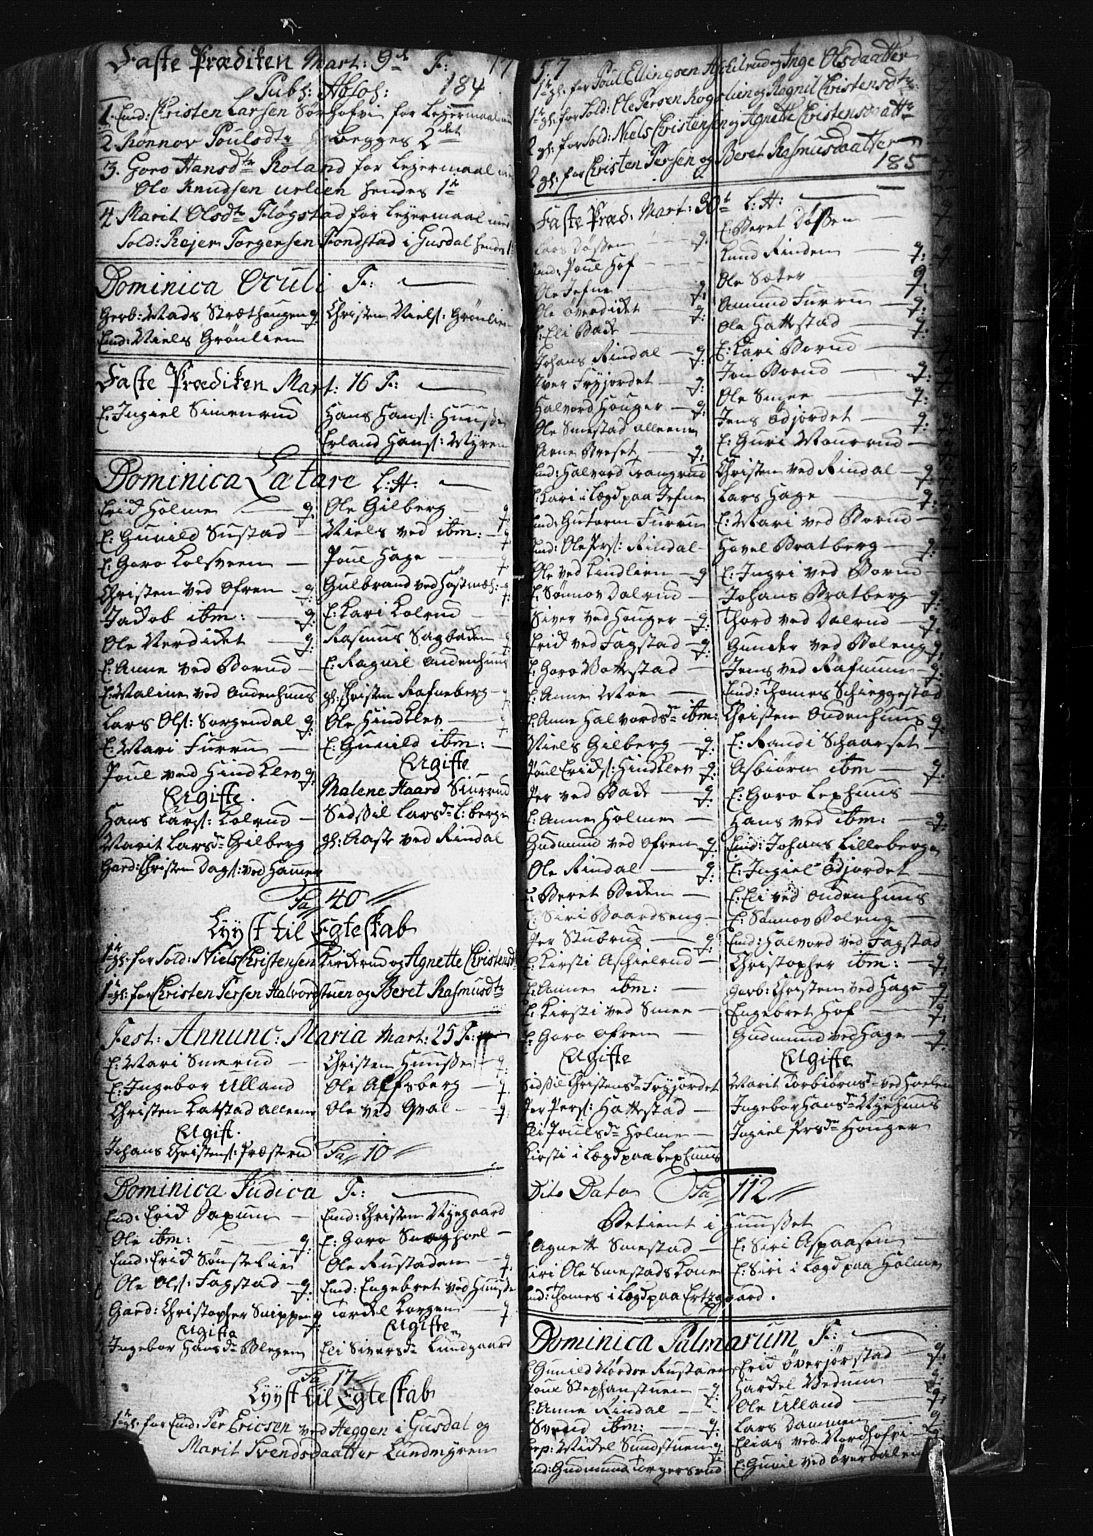 SAH, Fåberg prestekontor, Klokkerbok nr. 1, 1727-1767, s. 184-185